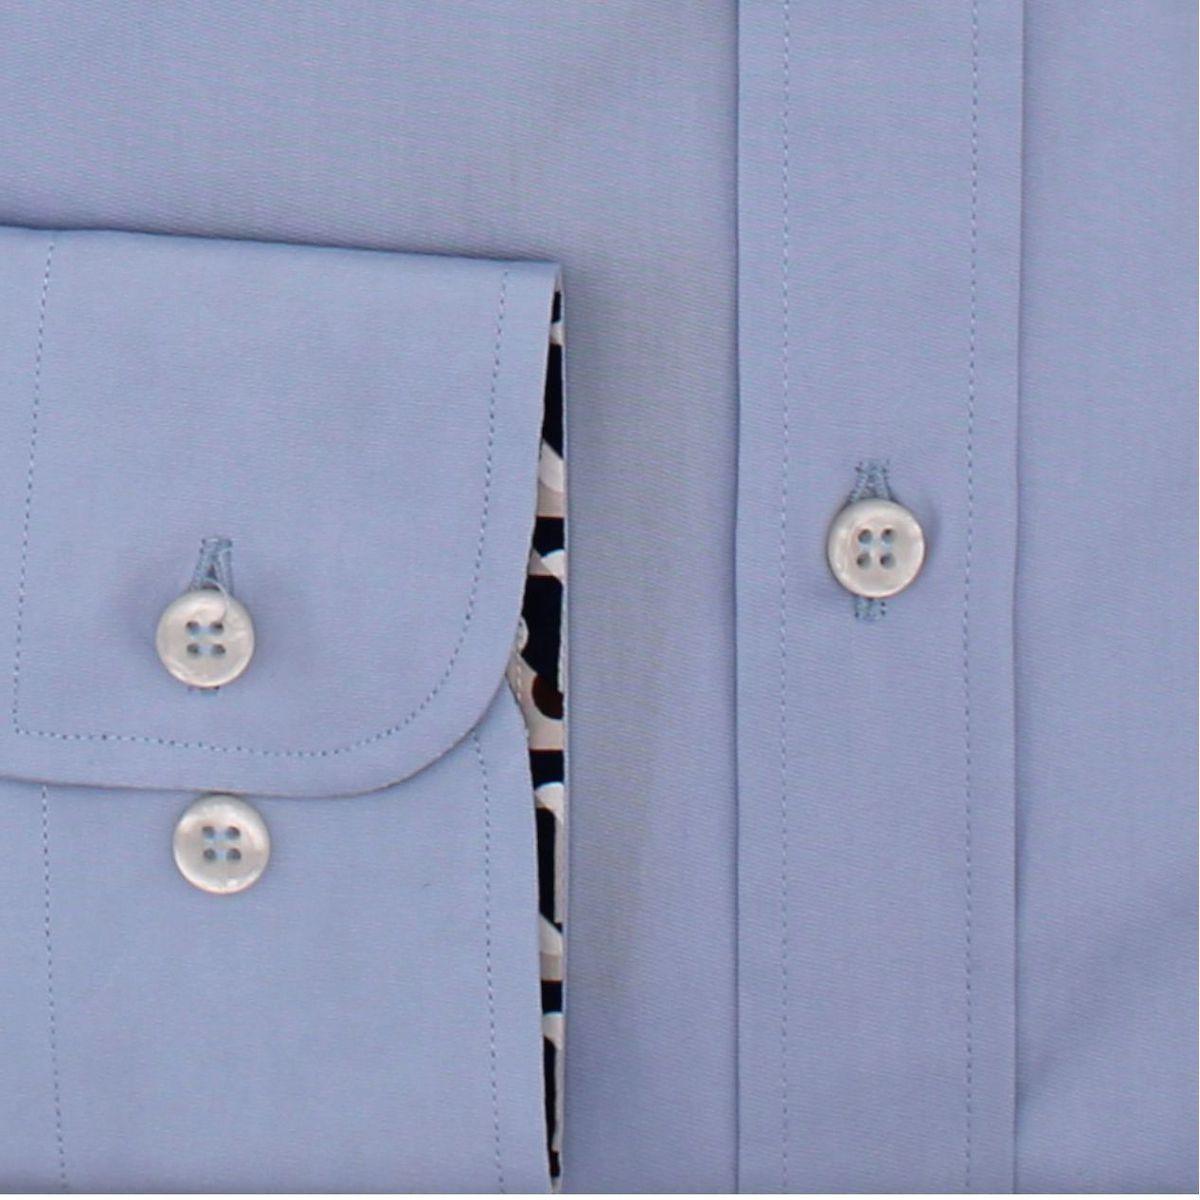 Camicia in cotone con stampa fantasia a contrasto Celeste PAUL & SHARK